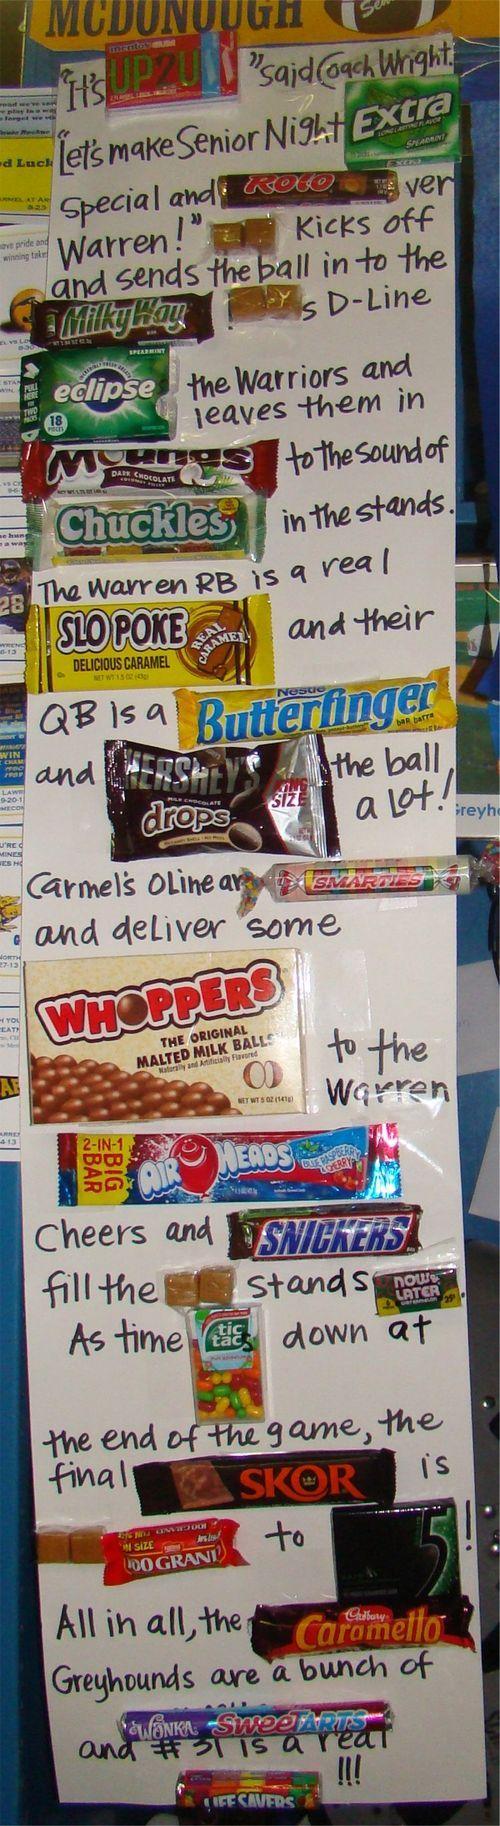 senior week | christmas gift ideas | pinterest | senior night gifts